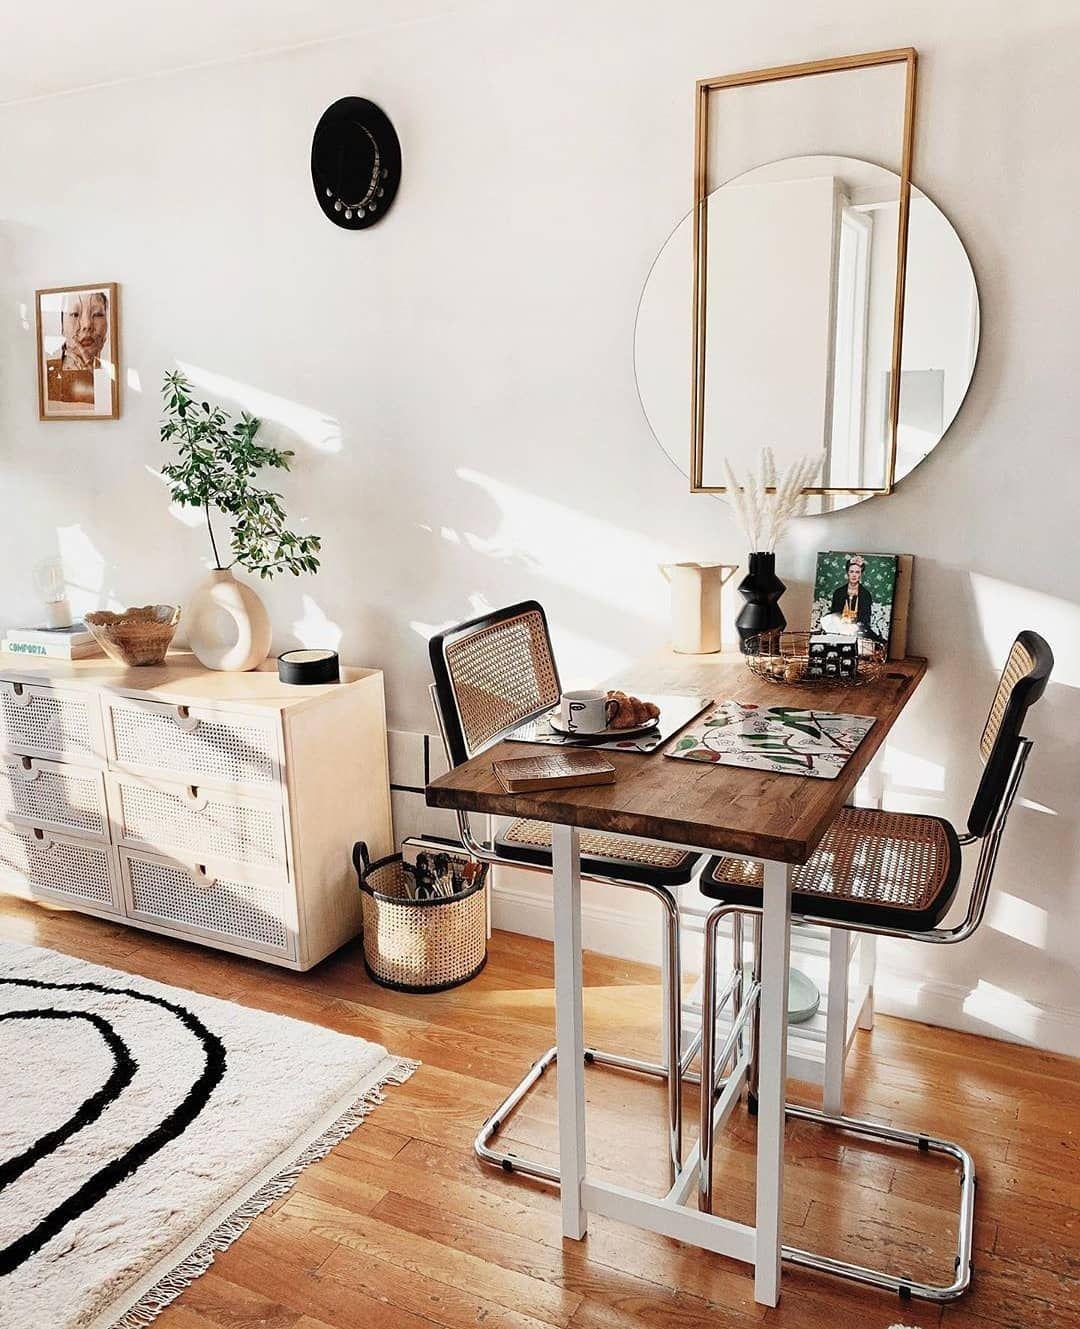 "𝐈𝐧𝐭𝐞𝐫𝐢𝐨𝐫𝐲𝐞𝐬𝐩𝐥𝐳 ® on Instagram: ""Love them both🤎 . . 📷: @viktoria.dahlberg & @reserve_home . . #interioryesplz #diningroomdecor #smallspacesquad #smallspaces…"""